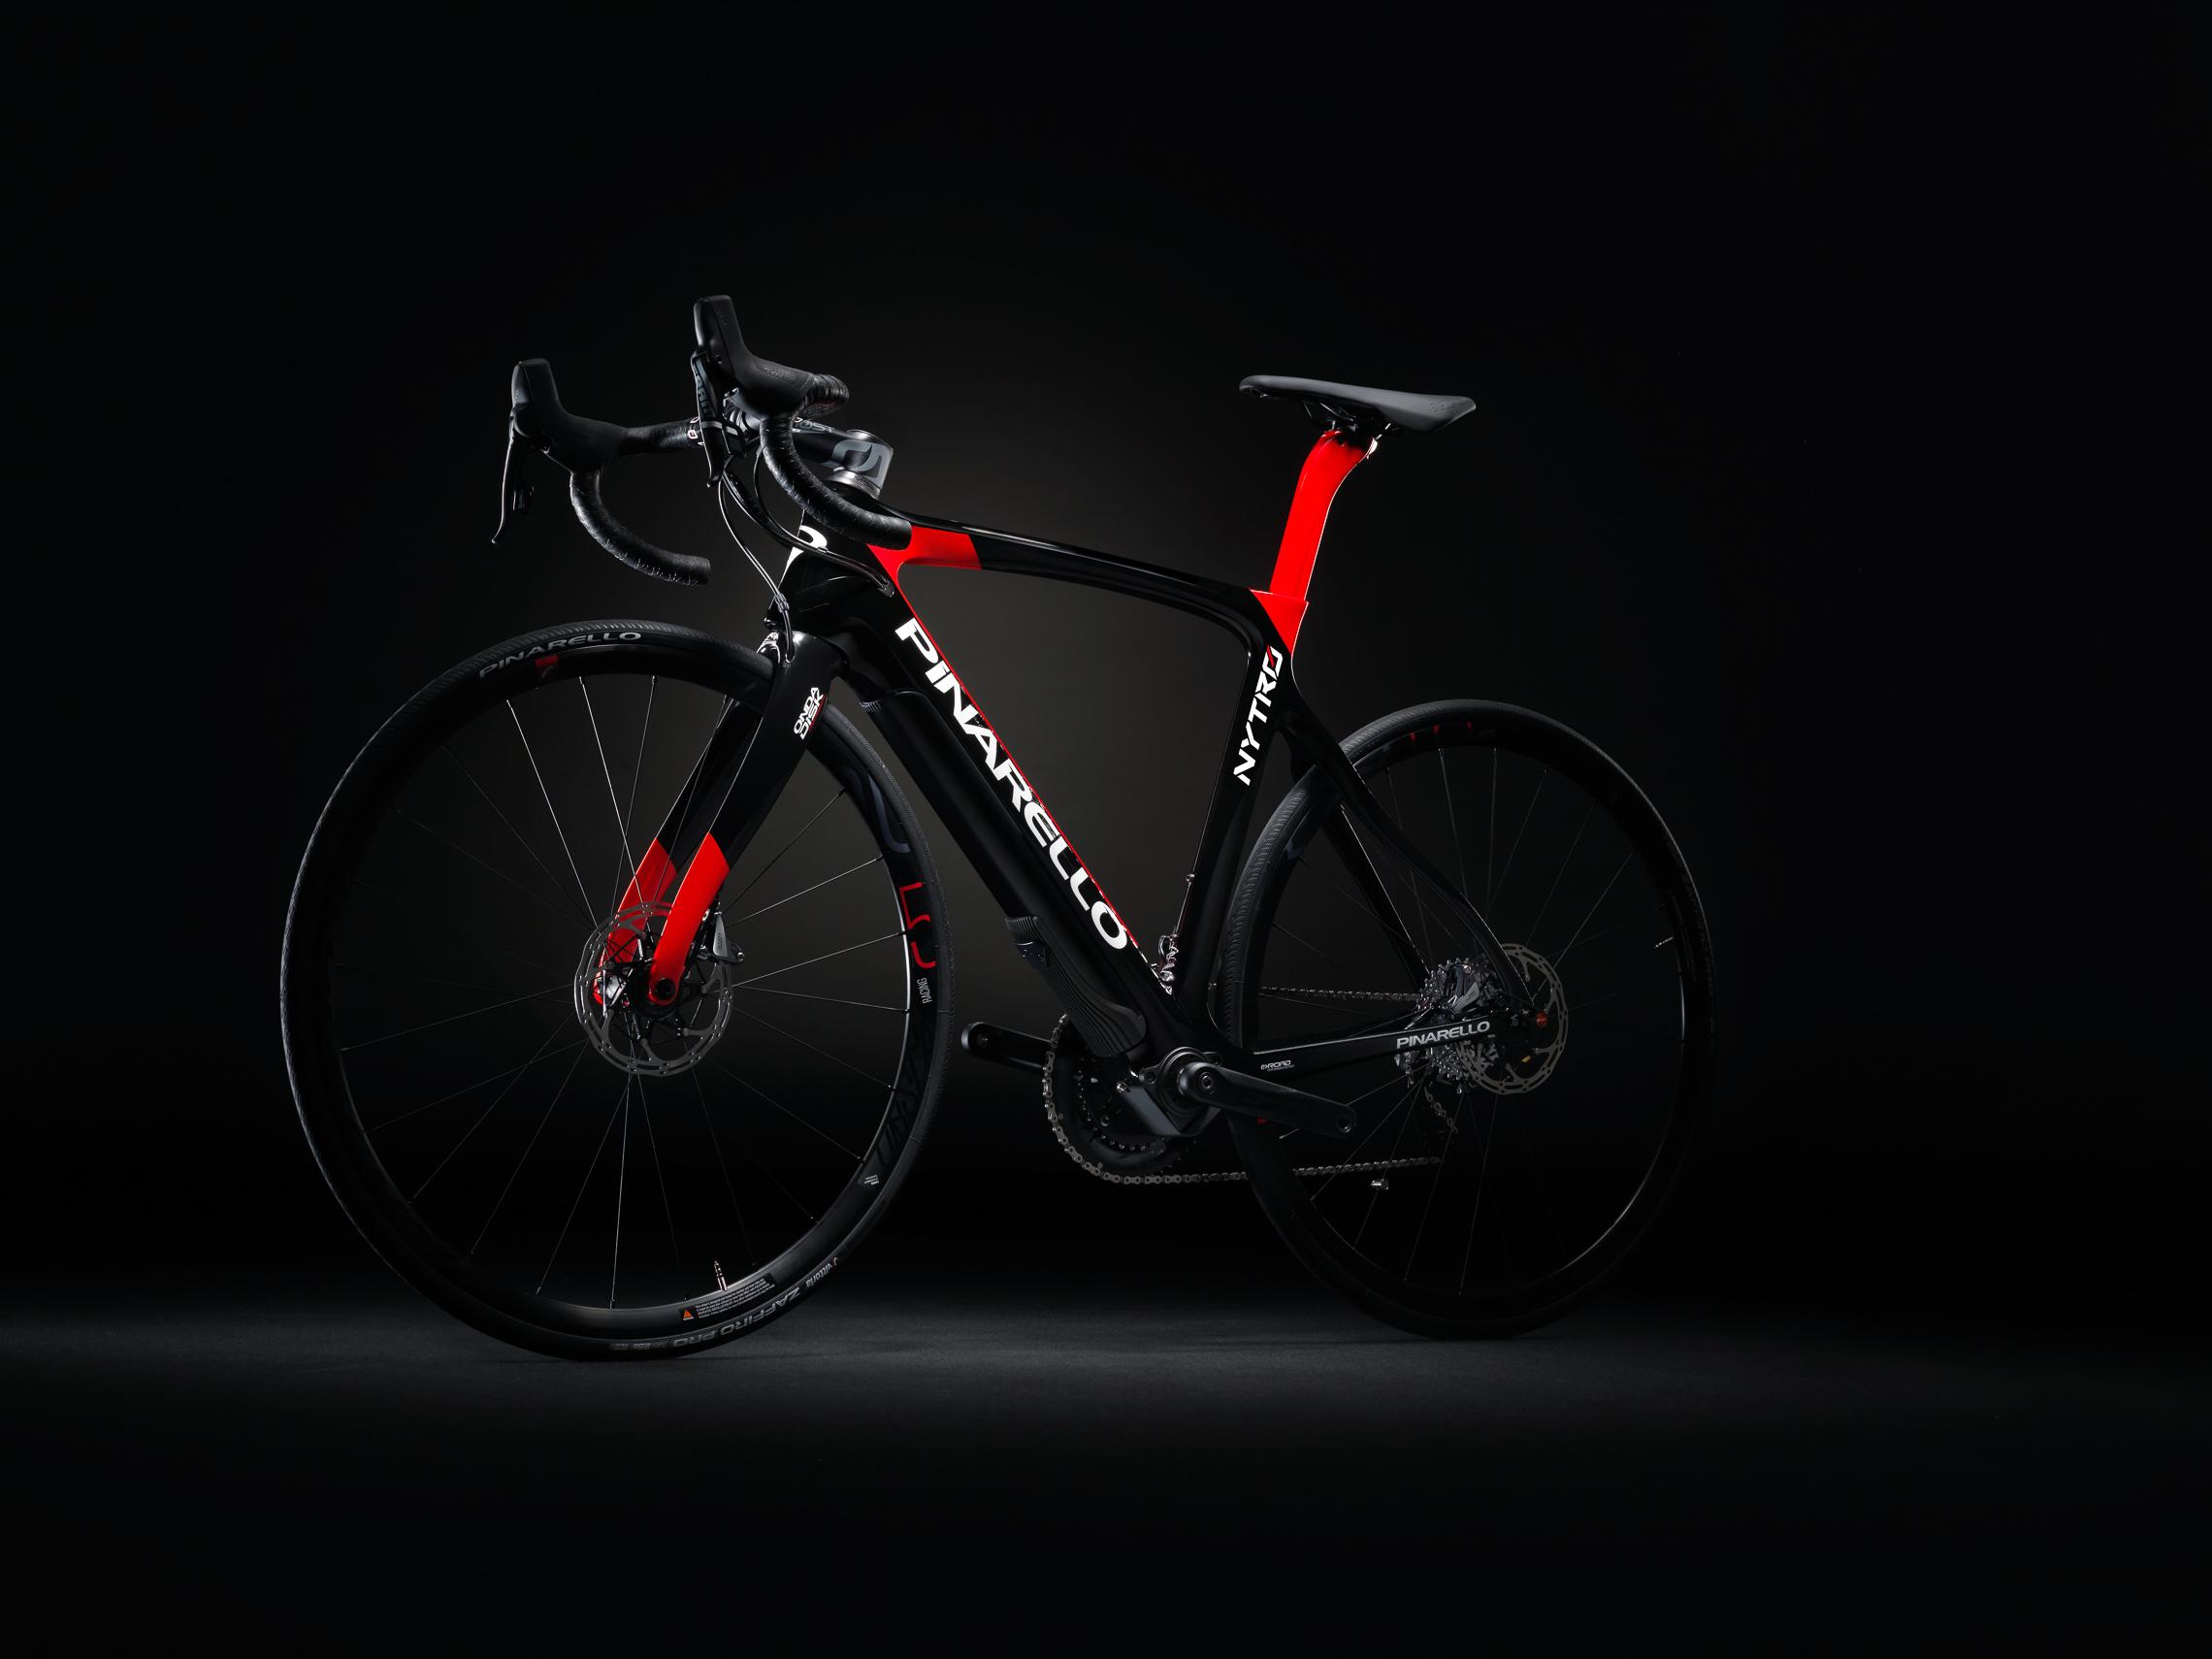 Neu: Pinarello Nytro – brandneues, superleichtes E-Roadbike mit ...